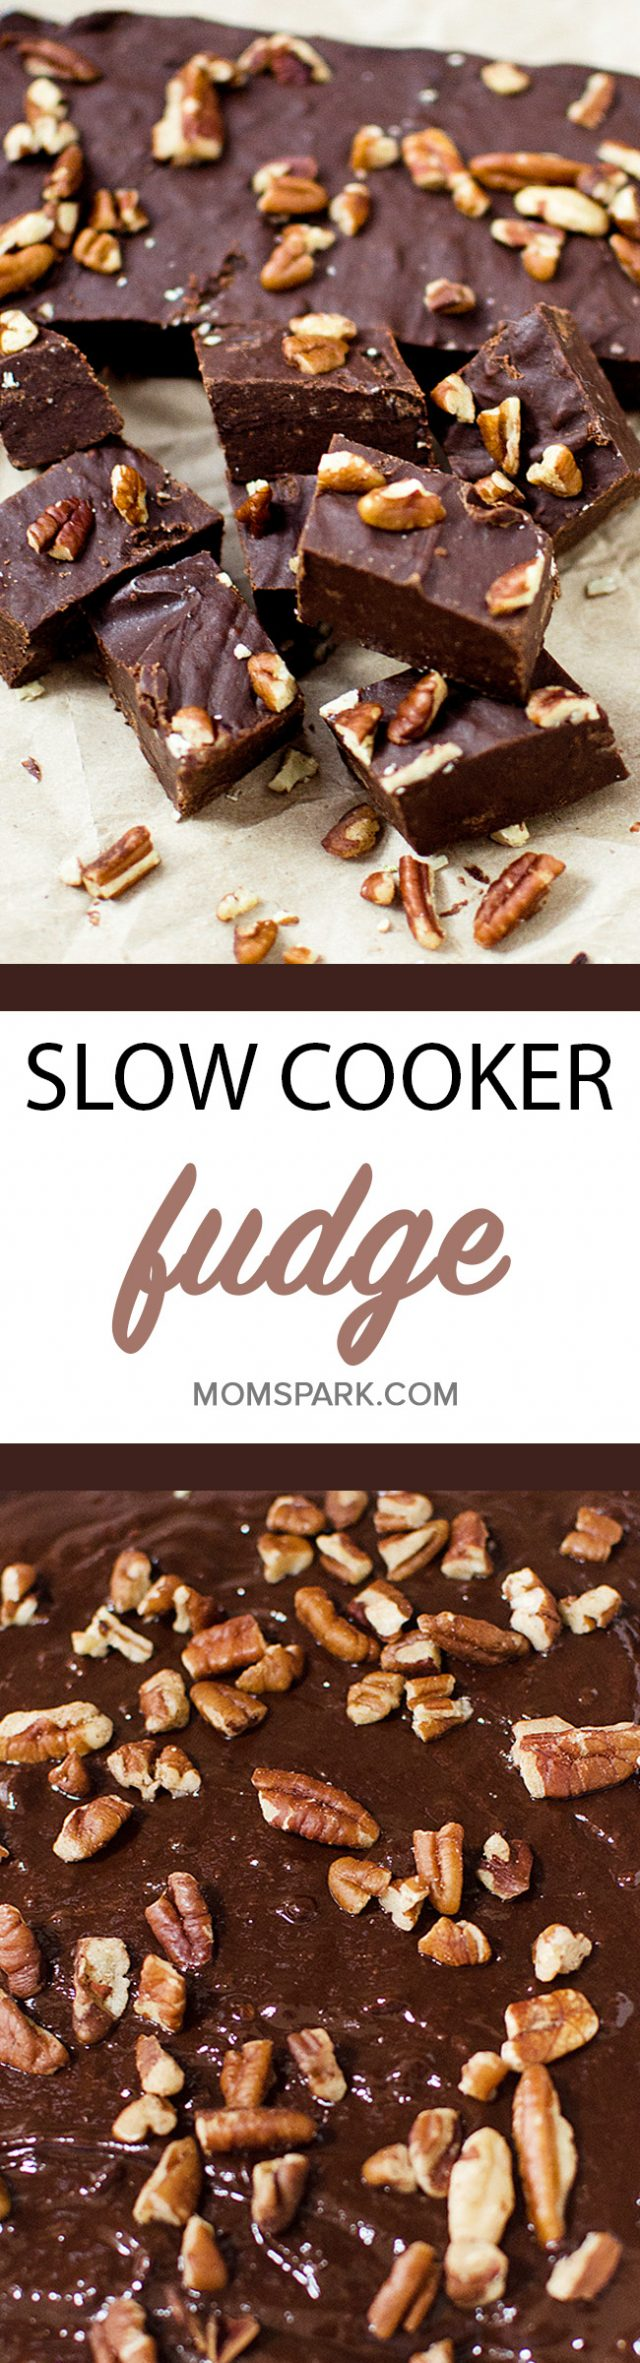 Slow Cooker Crockpot Chocolate Fudge Recipe